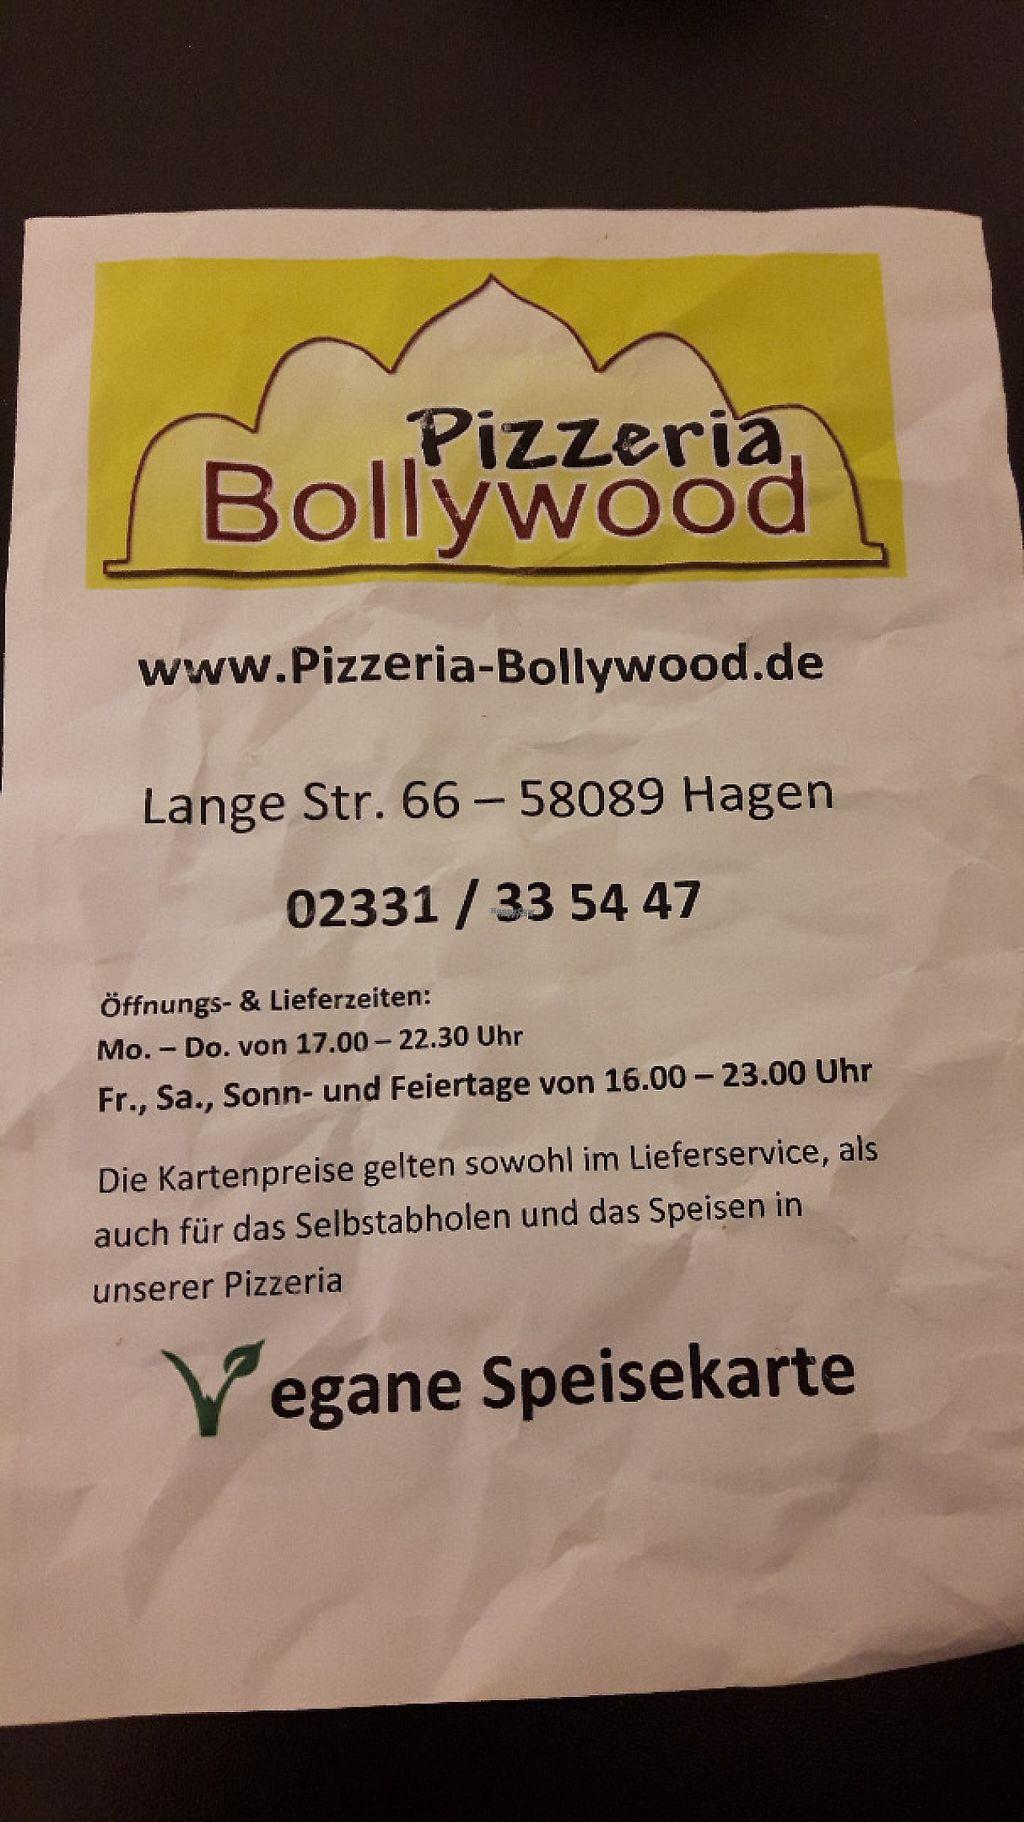 "Photo of Pizzeria Bollywood  by <a href=""/members/profile/saku"">saku</a> <br/>Vegan Menu <br/> February 11, 2017  - <a href='/contact/abuse/image/86969/225330'>Report</a>"